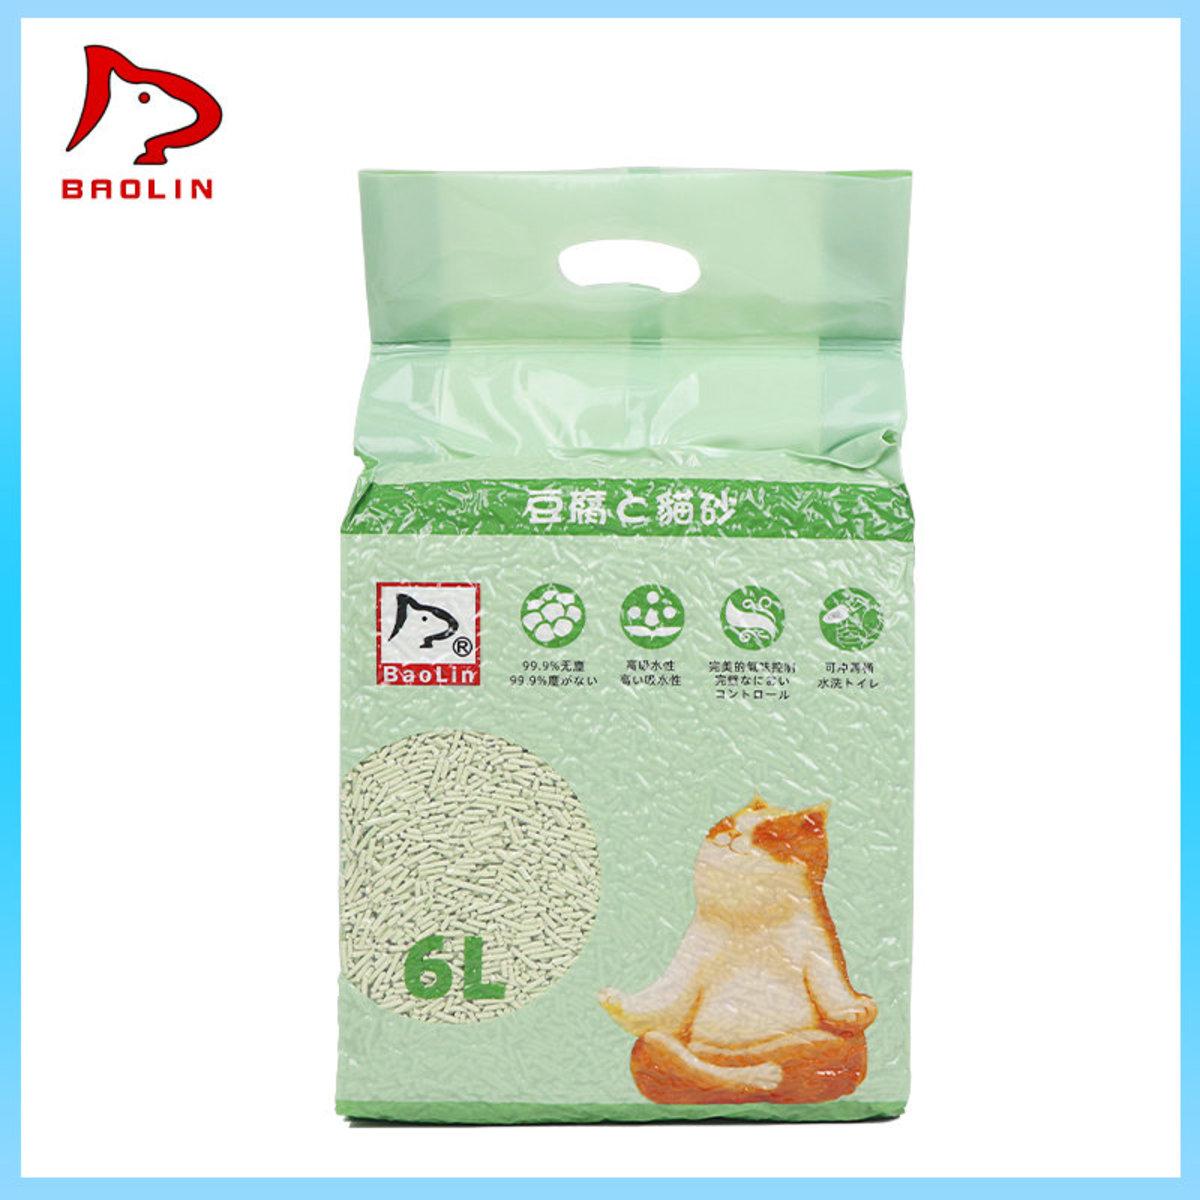 Tofu Cat Litter - Green Tea 2.5KG